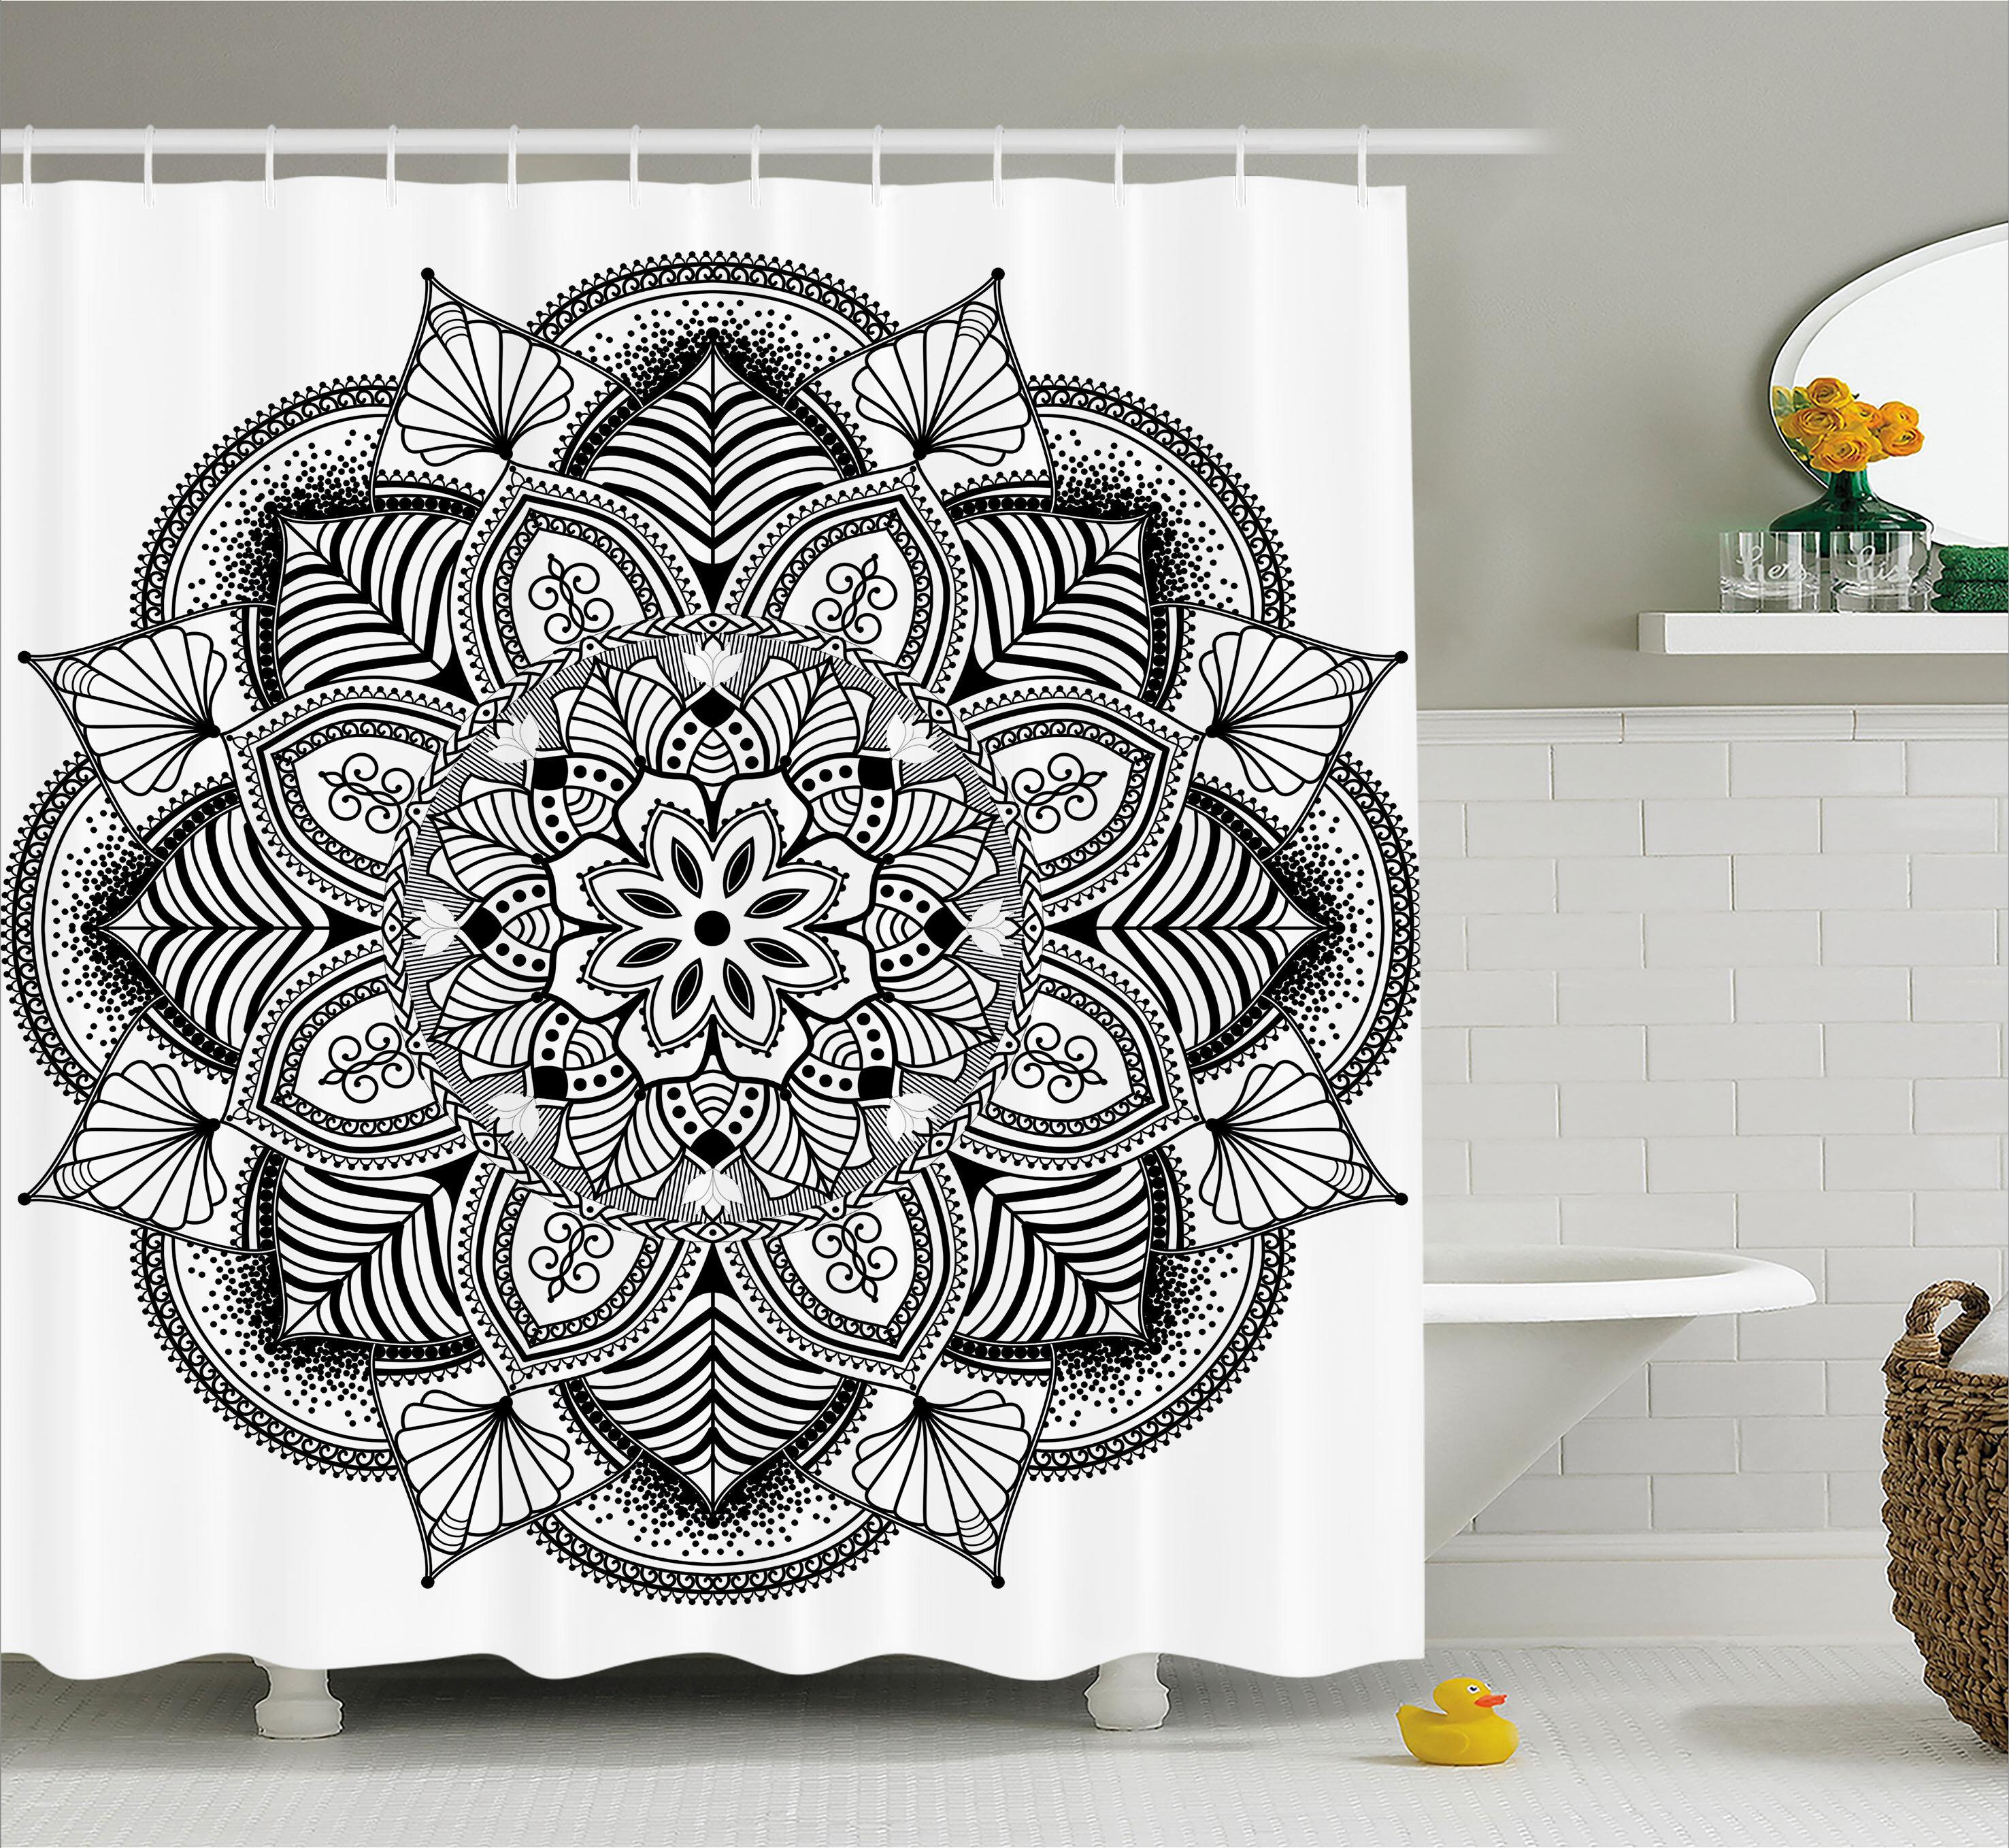 Ebern Designs Barbara Mandala Ringed Ethnic Floral Pattern With Ornate Tile And Lines Boho Circle Home Art Single Shower Curtain Wayfair Ca